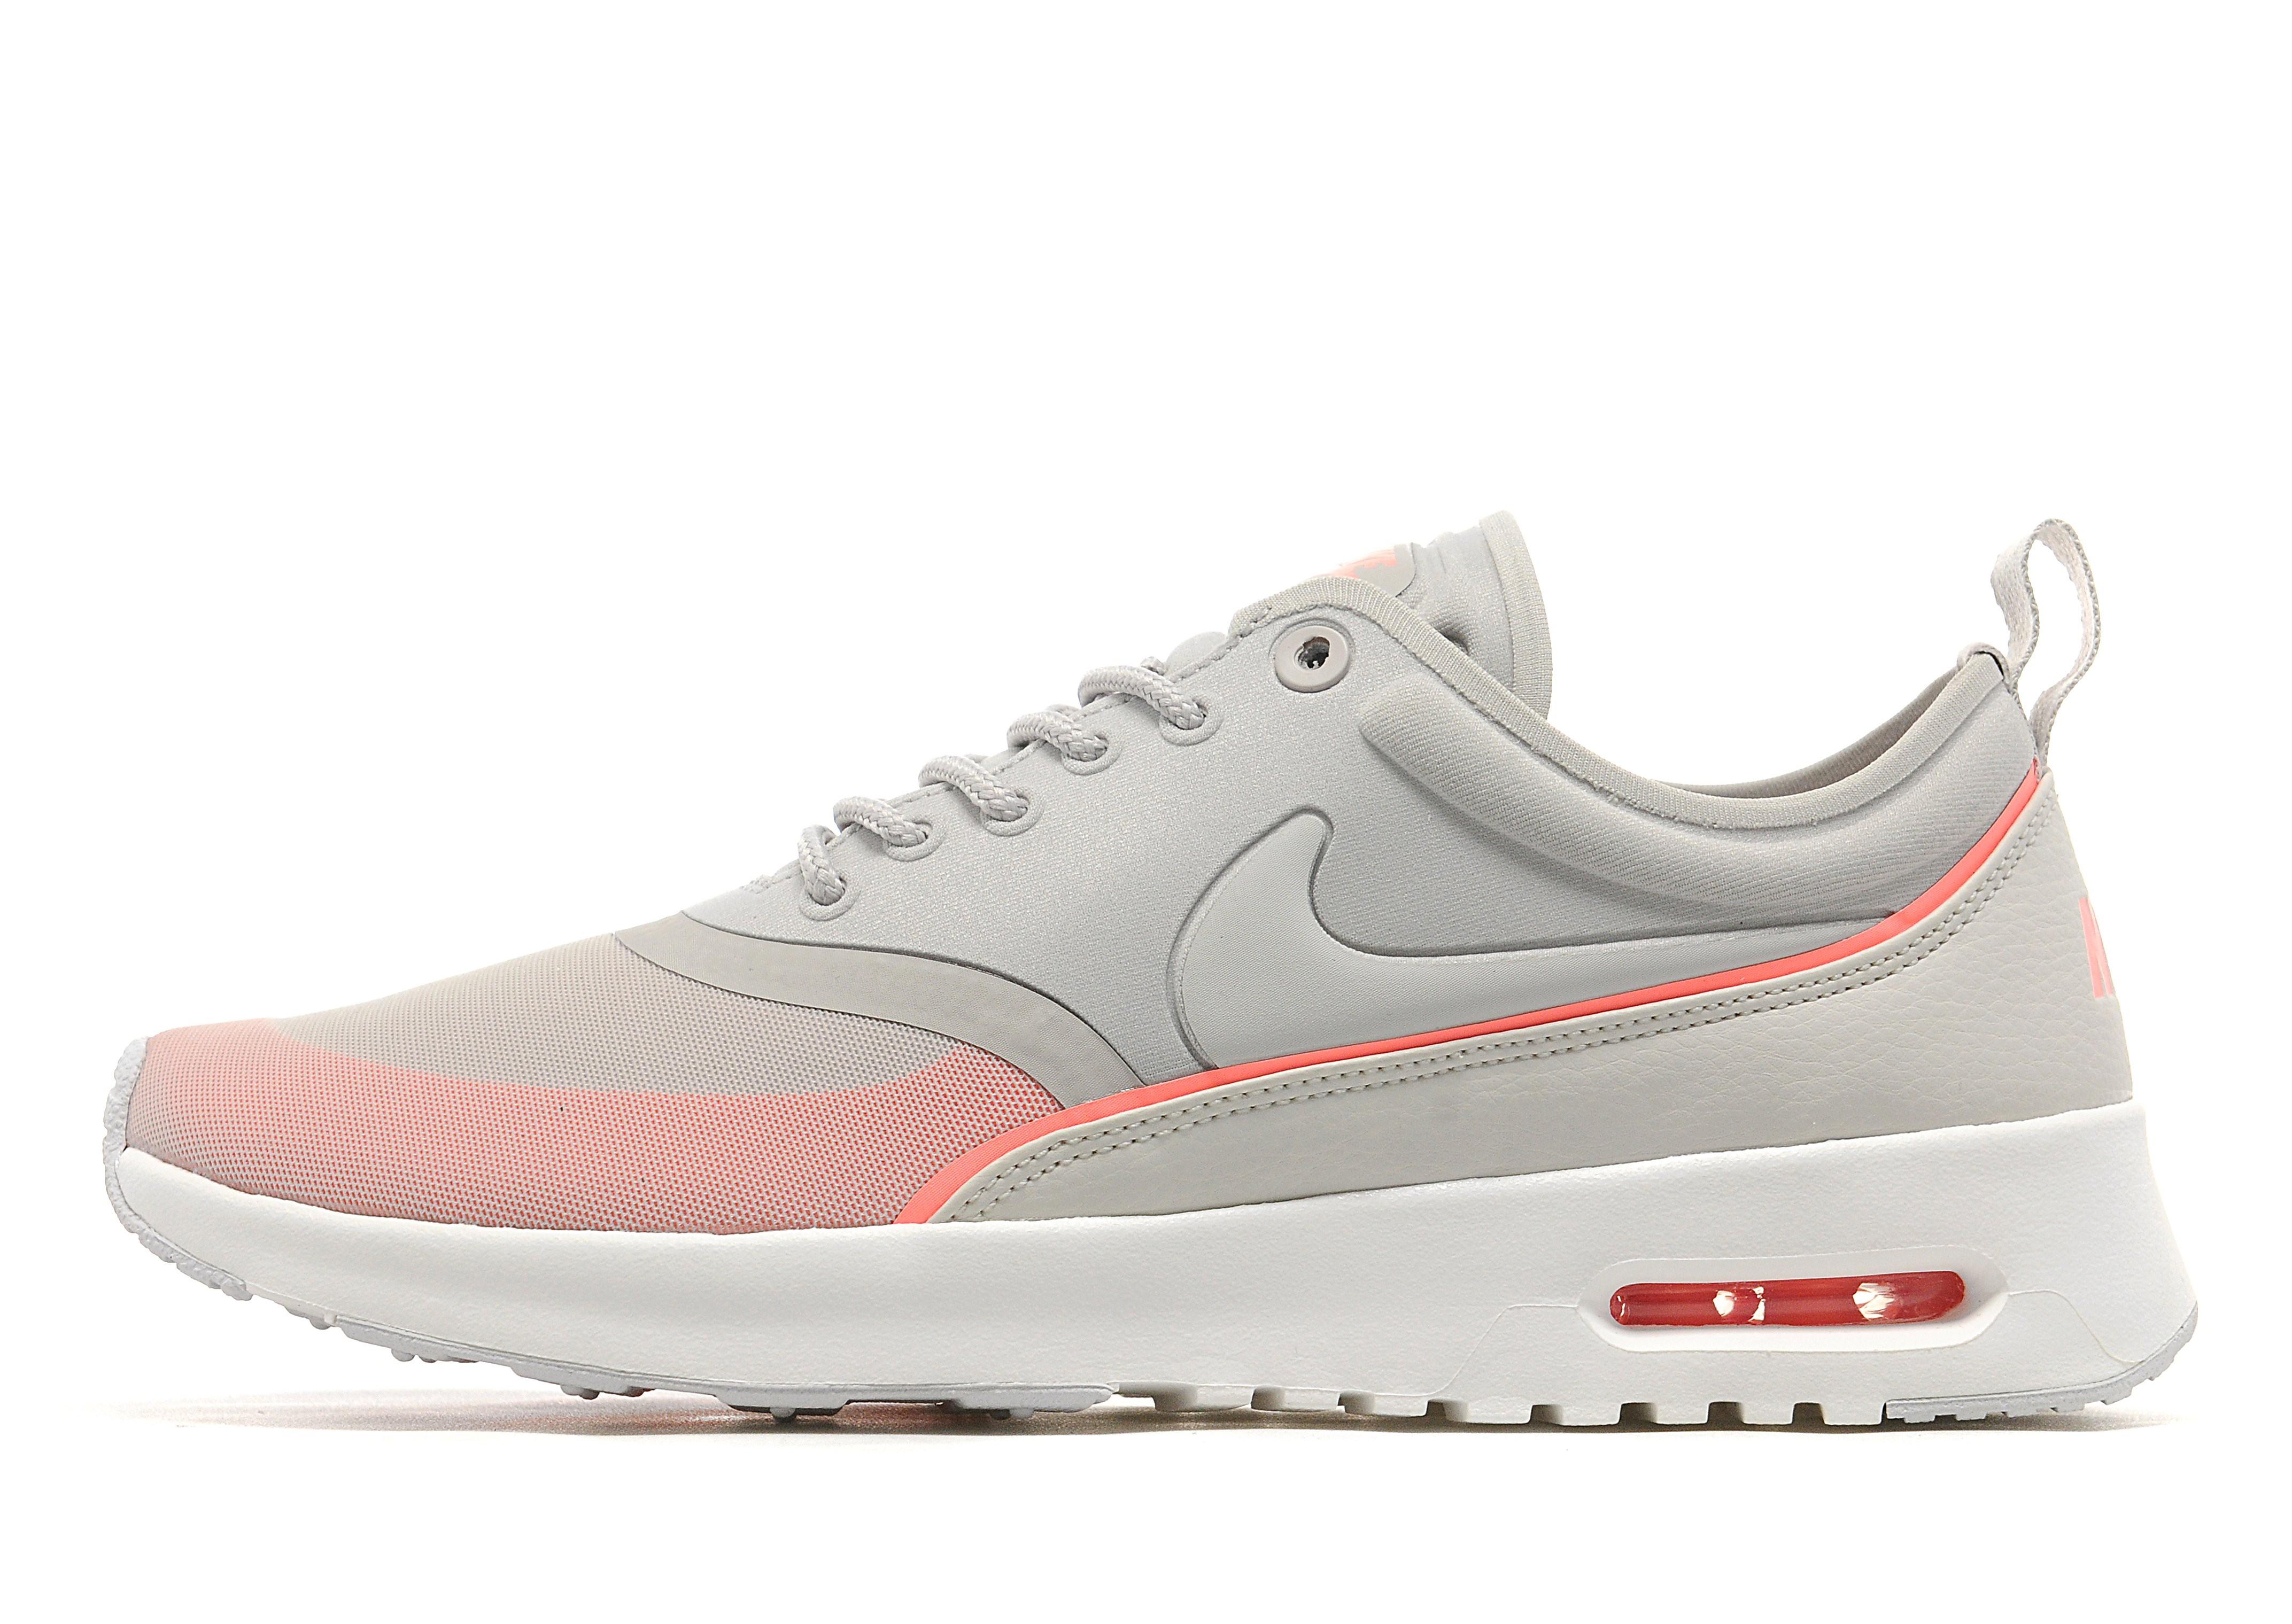 Nike Air Max Thea Ultra Women's